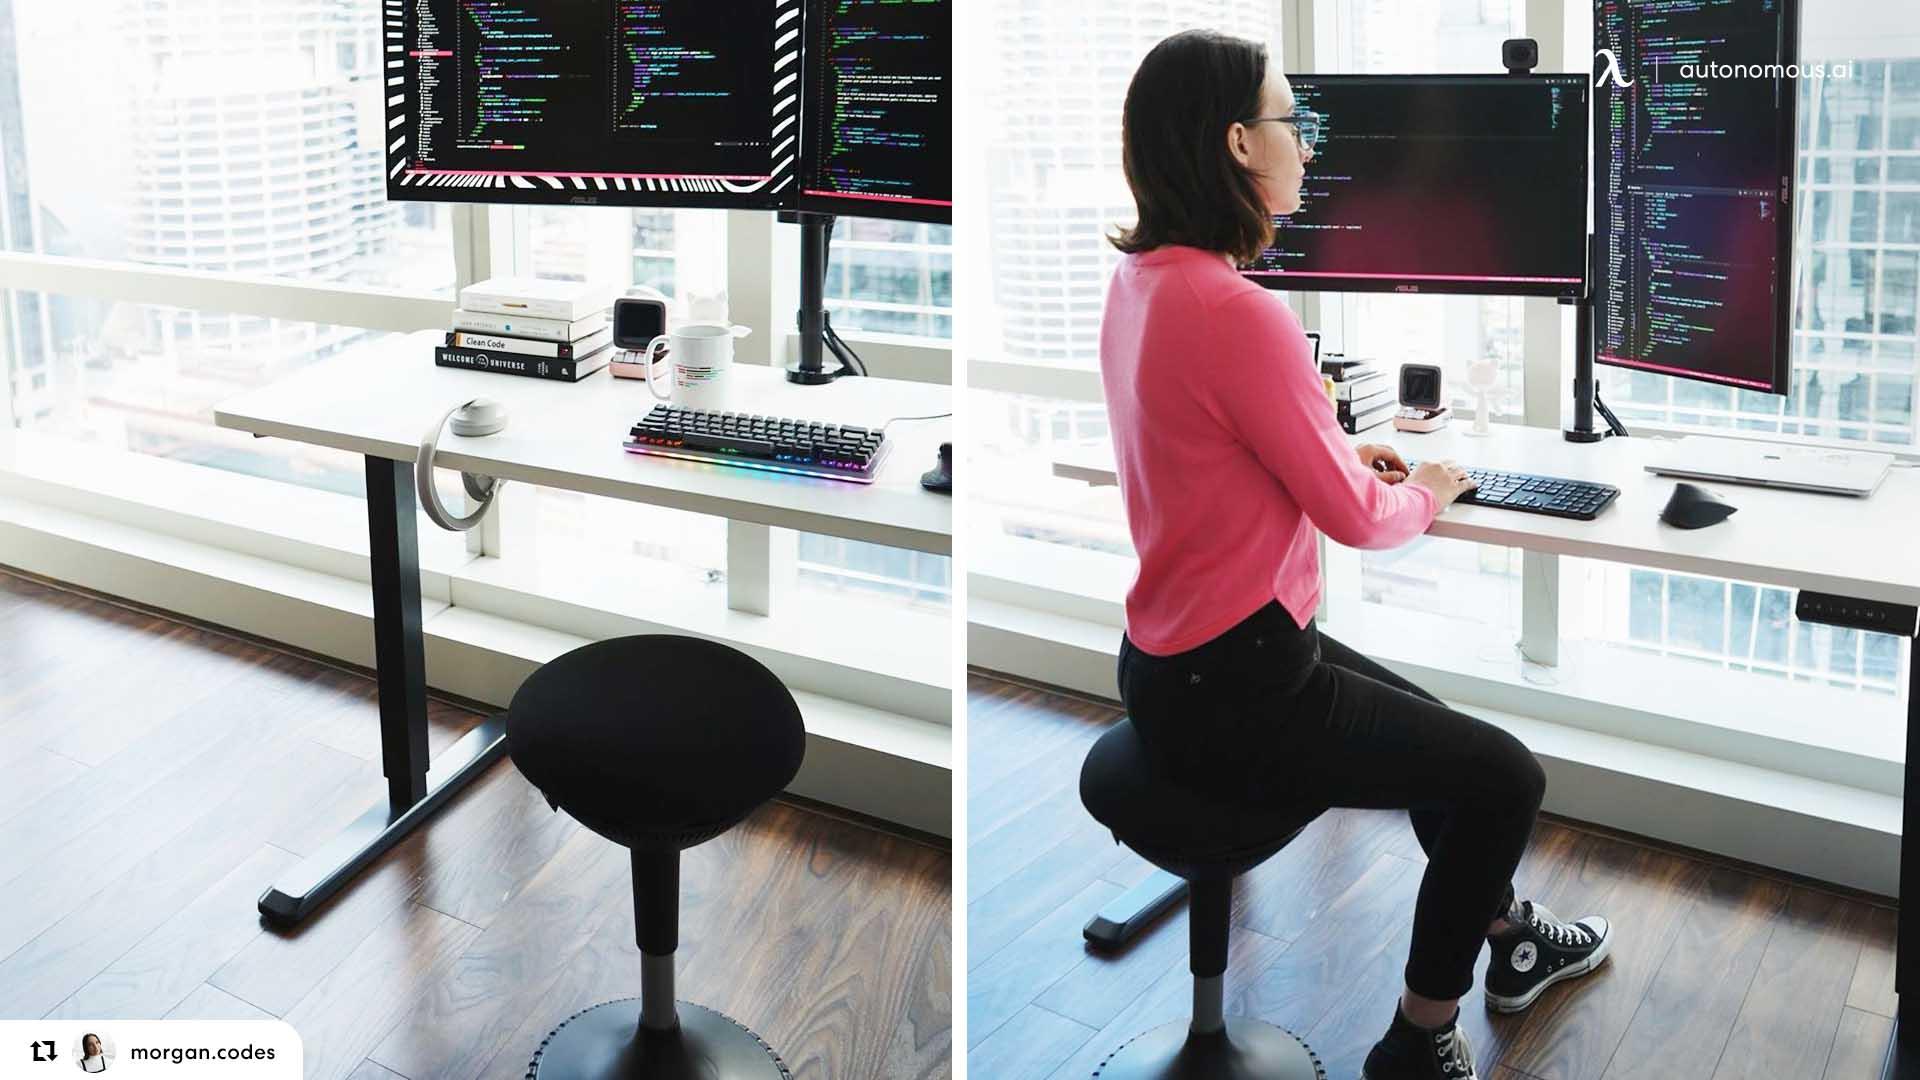 Some alternative ergonomic chair